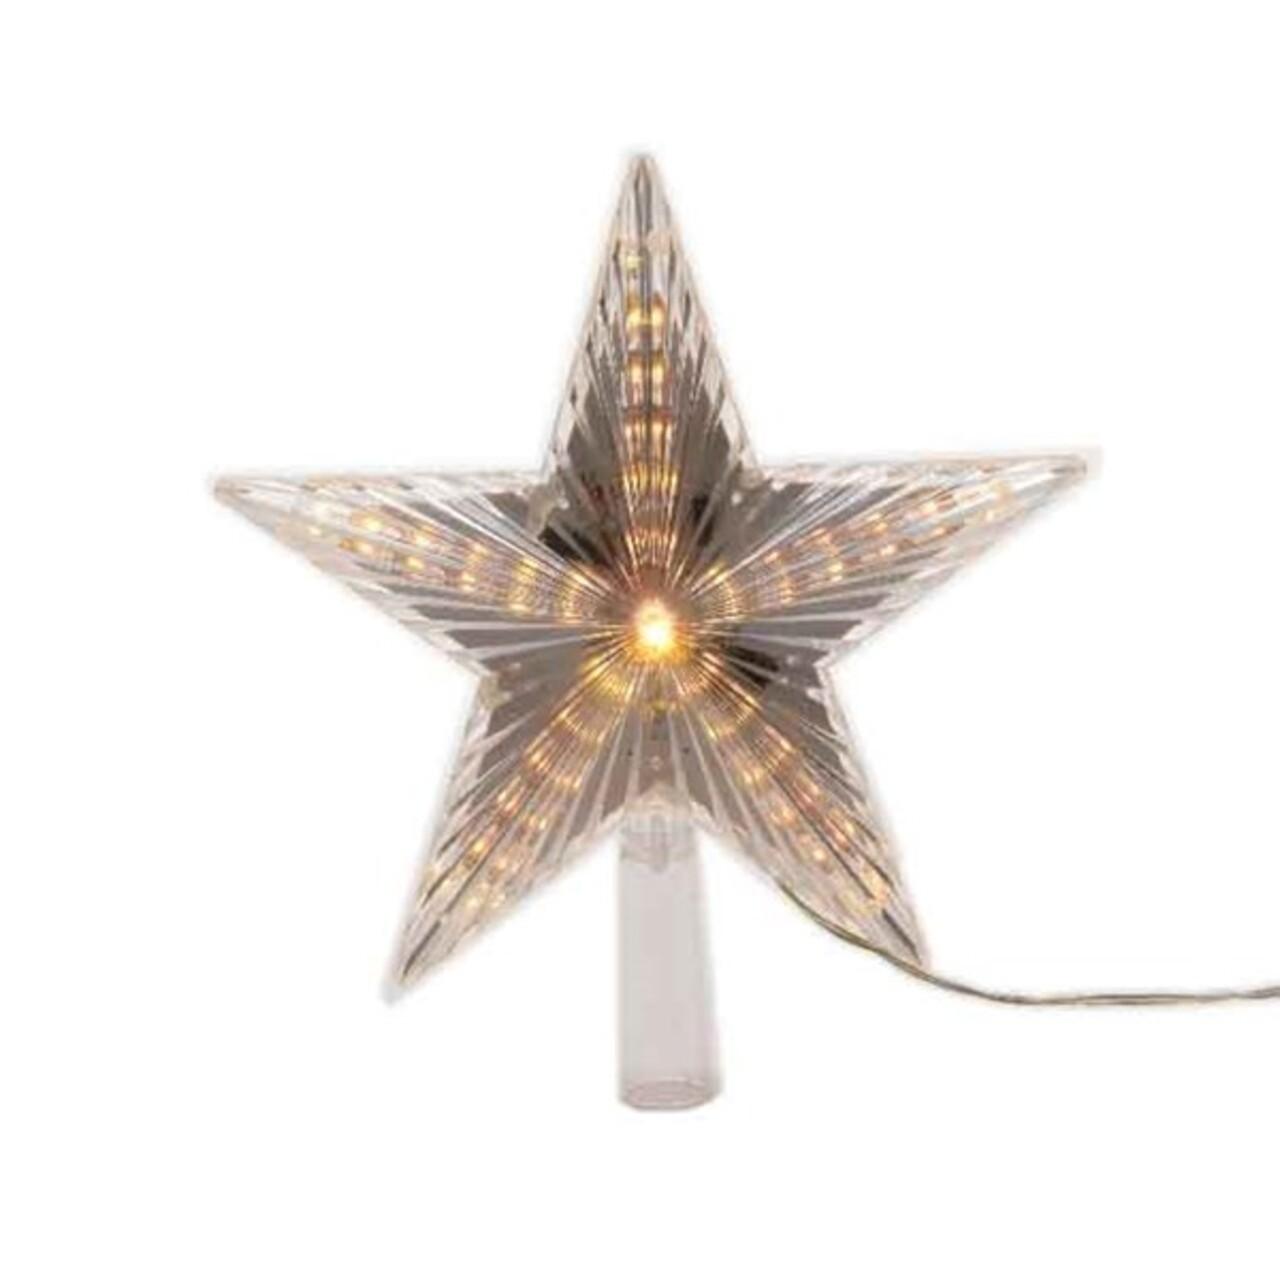 Decoratiune luminoasa Star, Lumineo, 31 LED-uri, alb